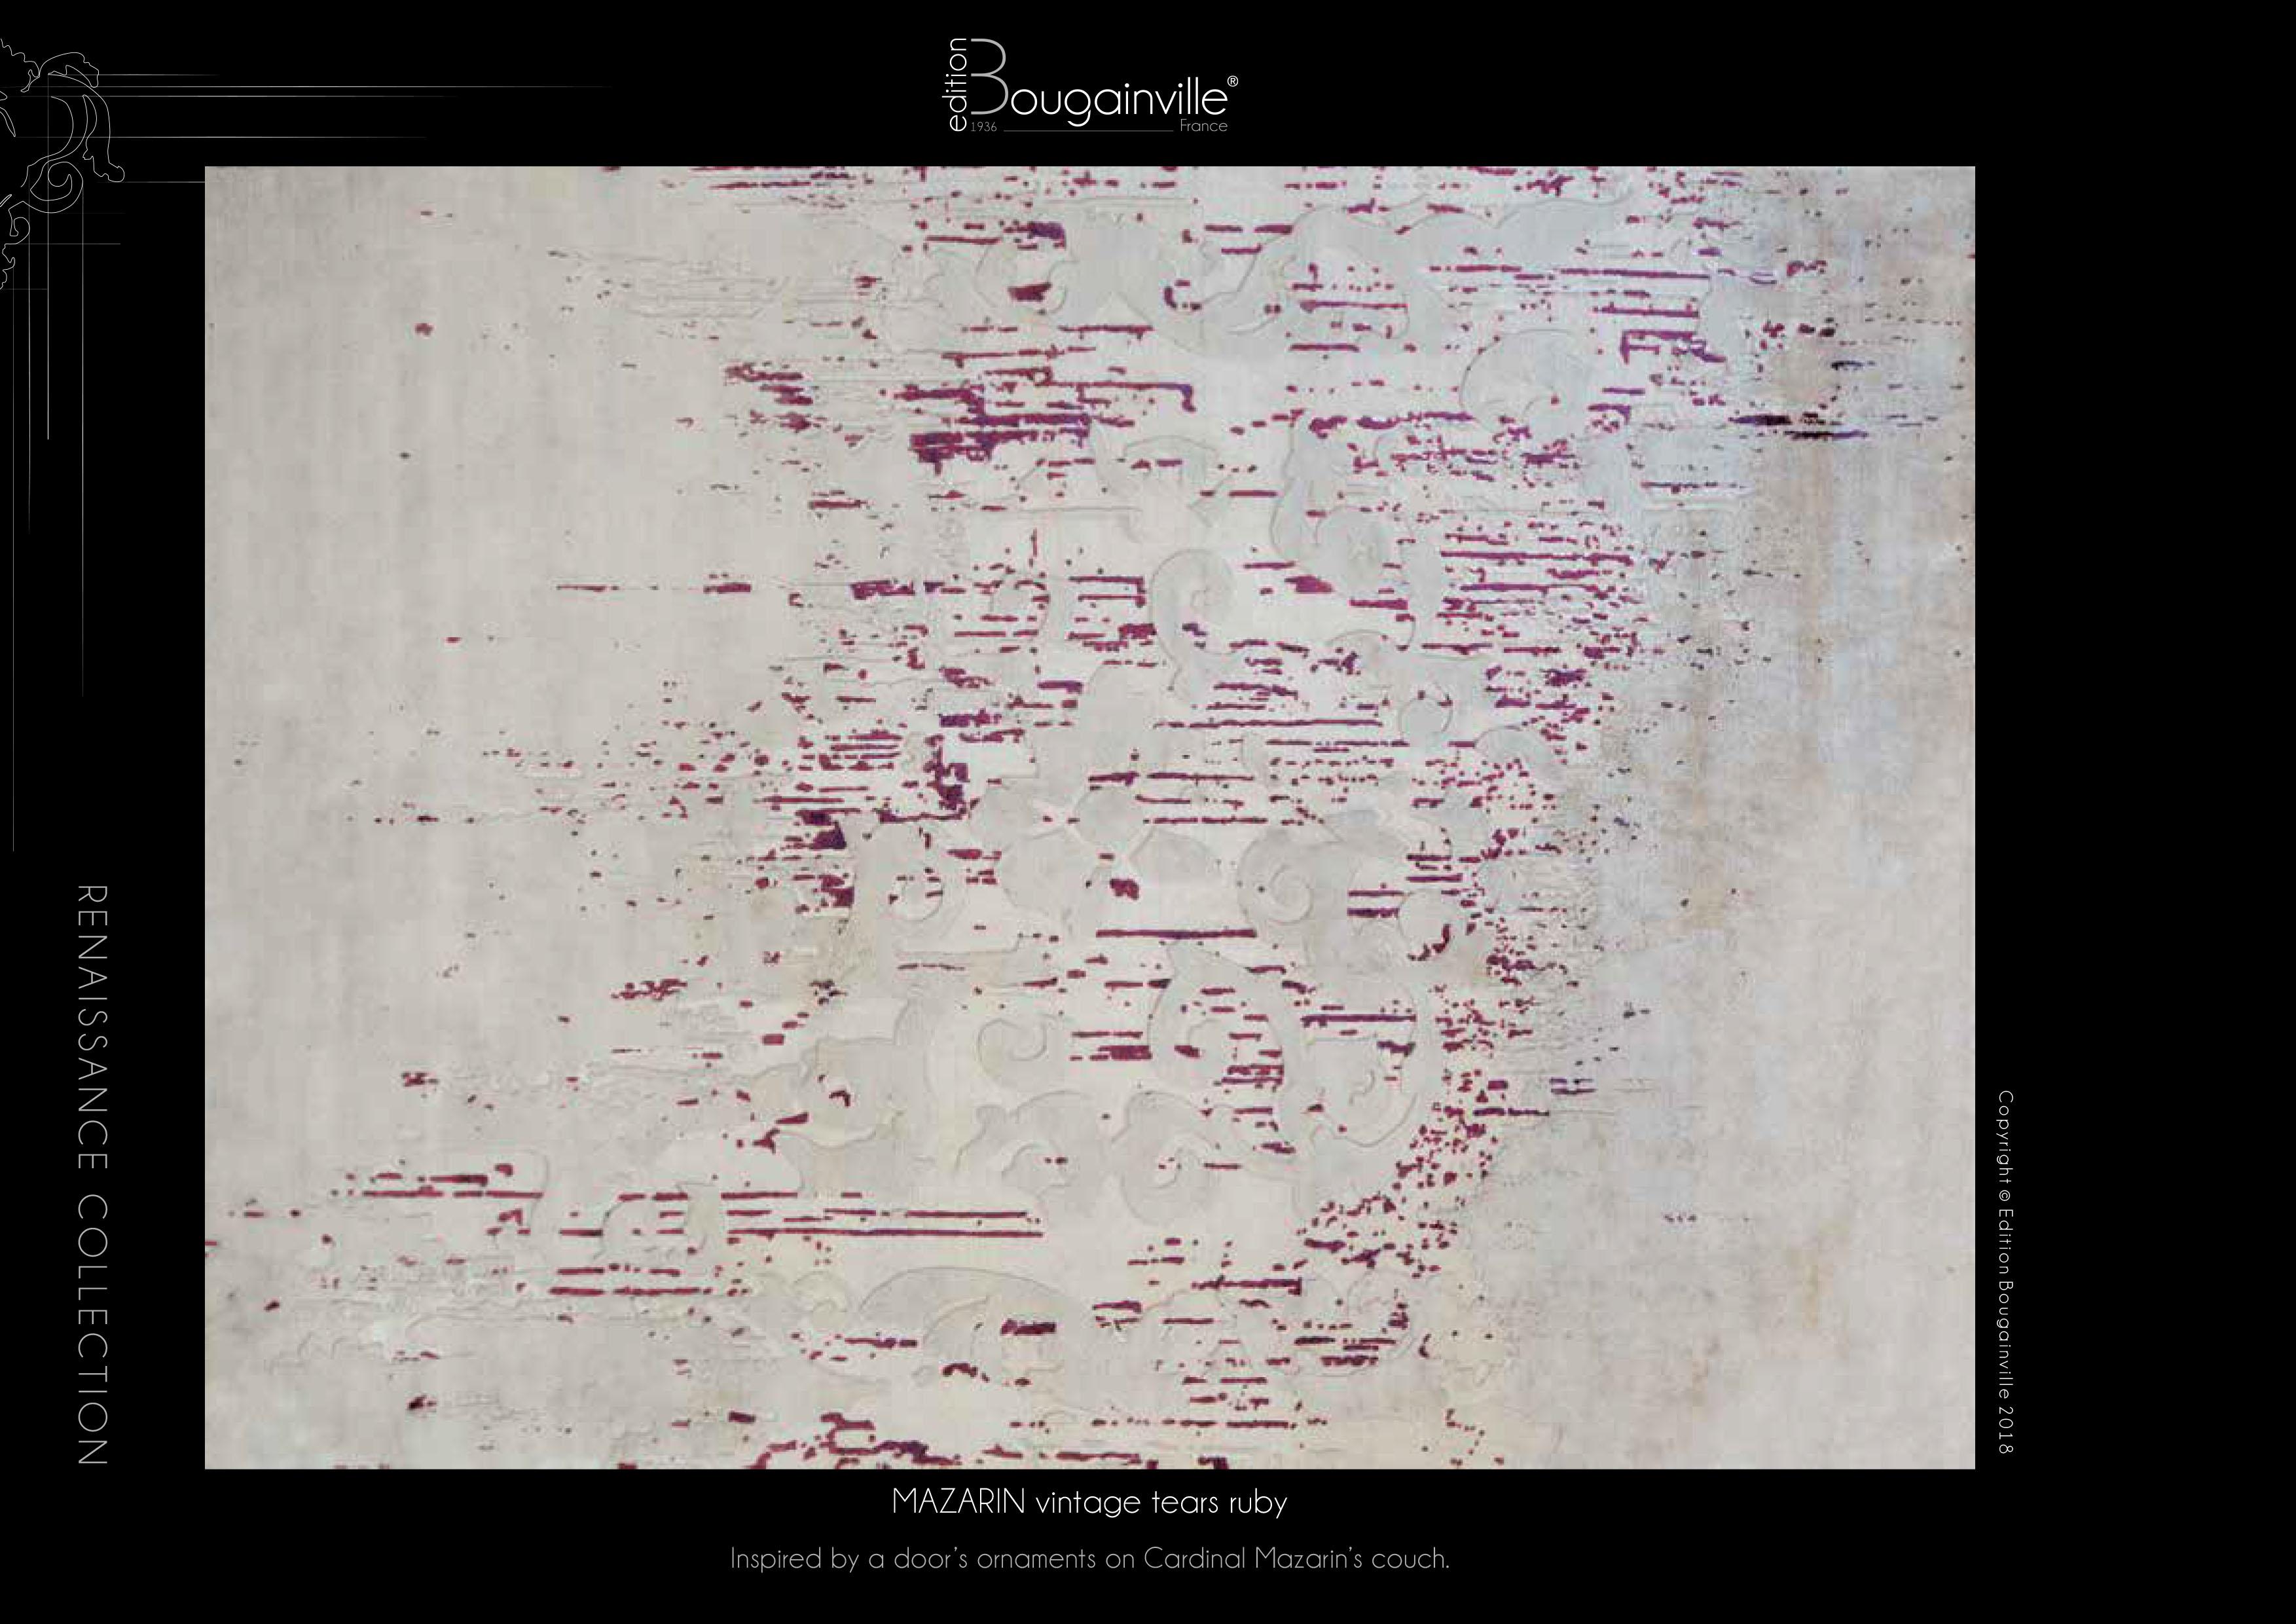 Ковер Edition Bougainville, MAZARIN vintage tears ruby